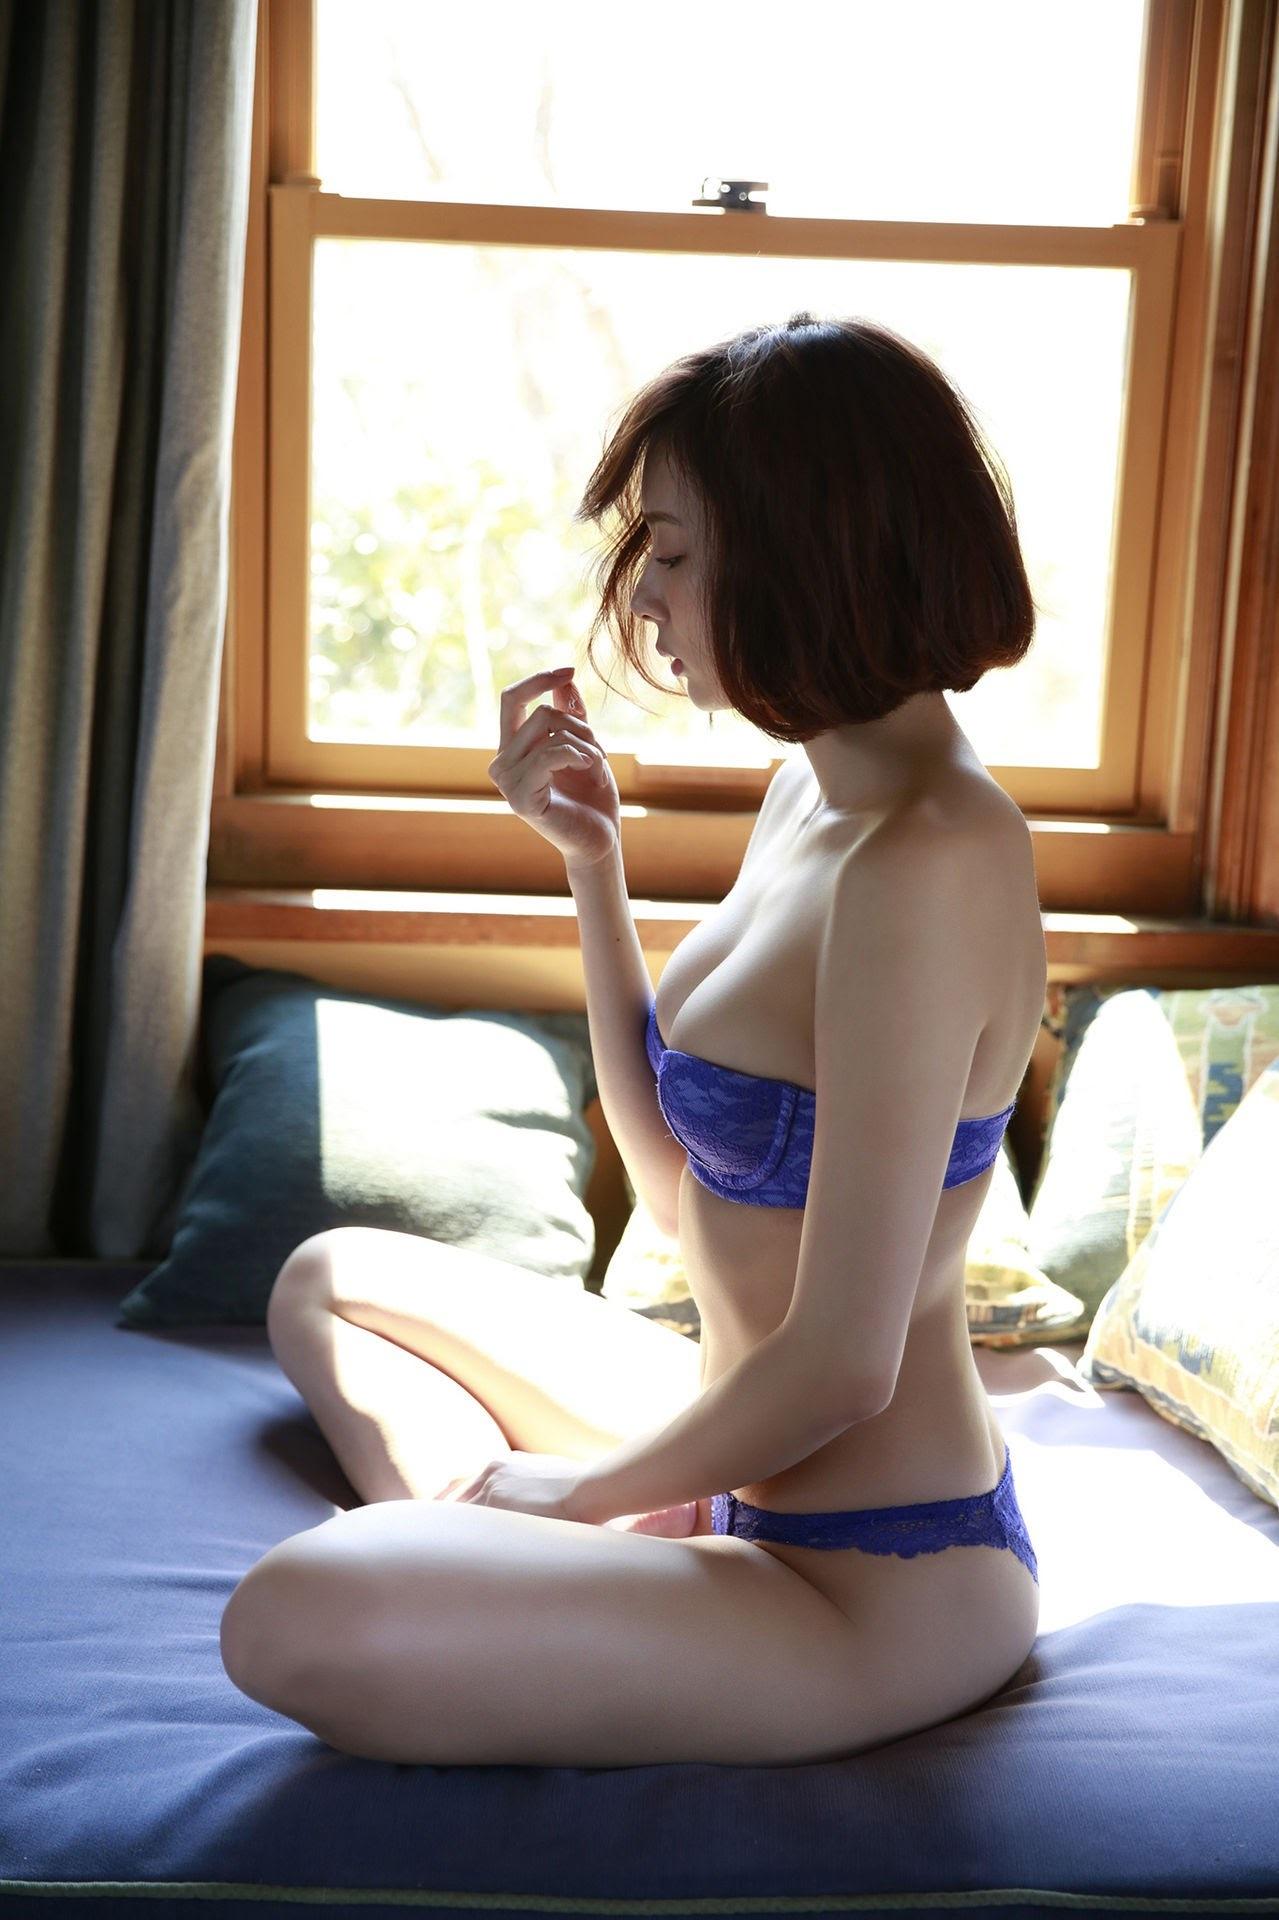 23 years old Shaka Okada, who is also a professional mahjong player021